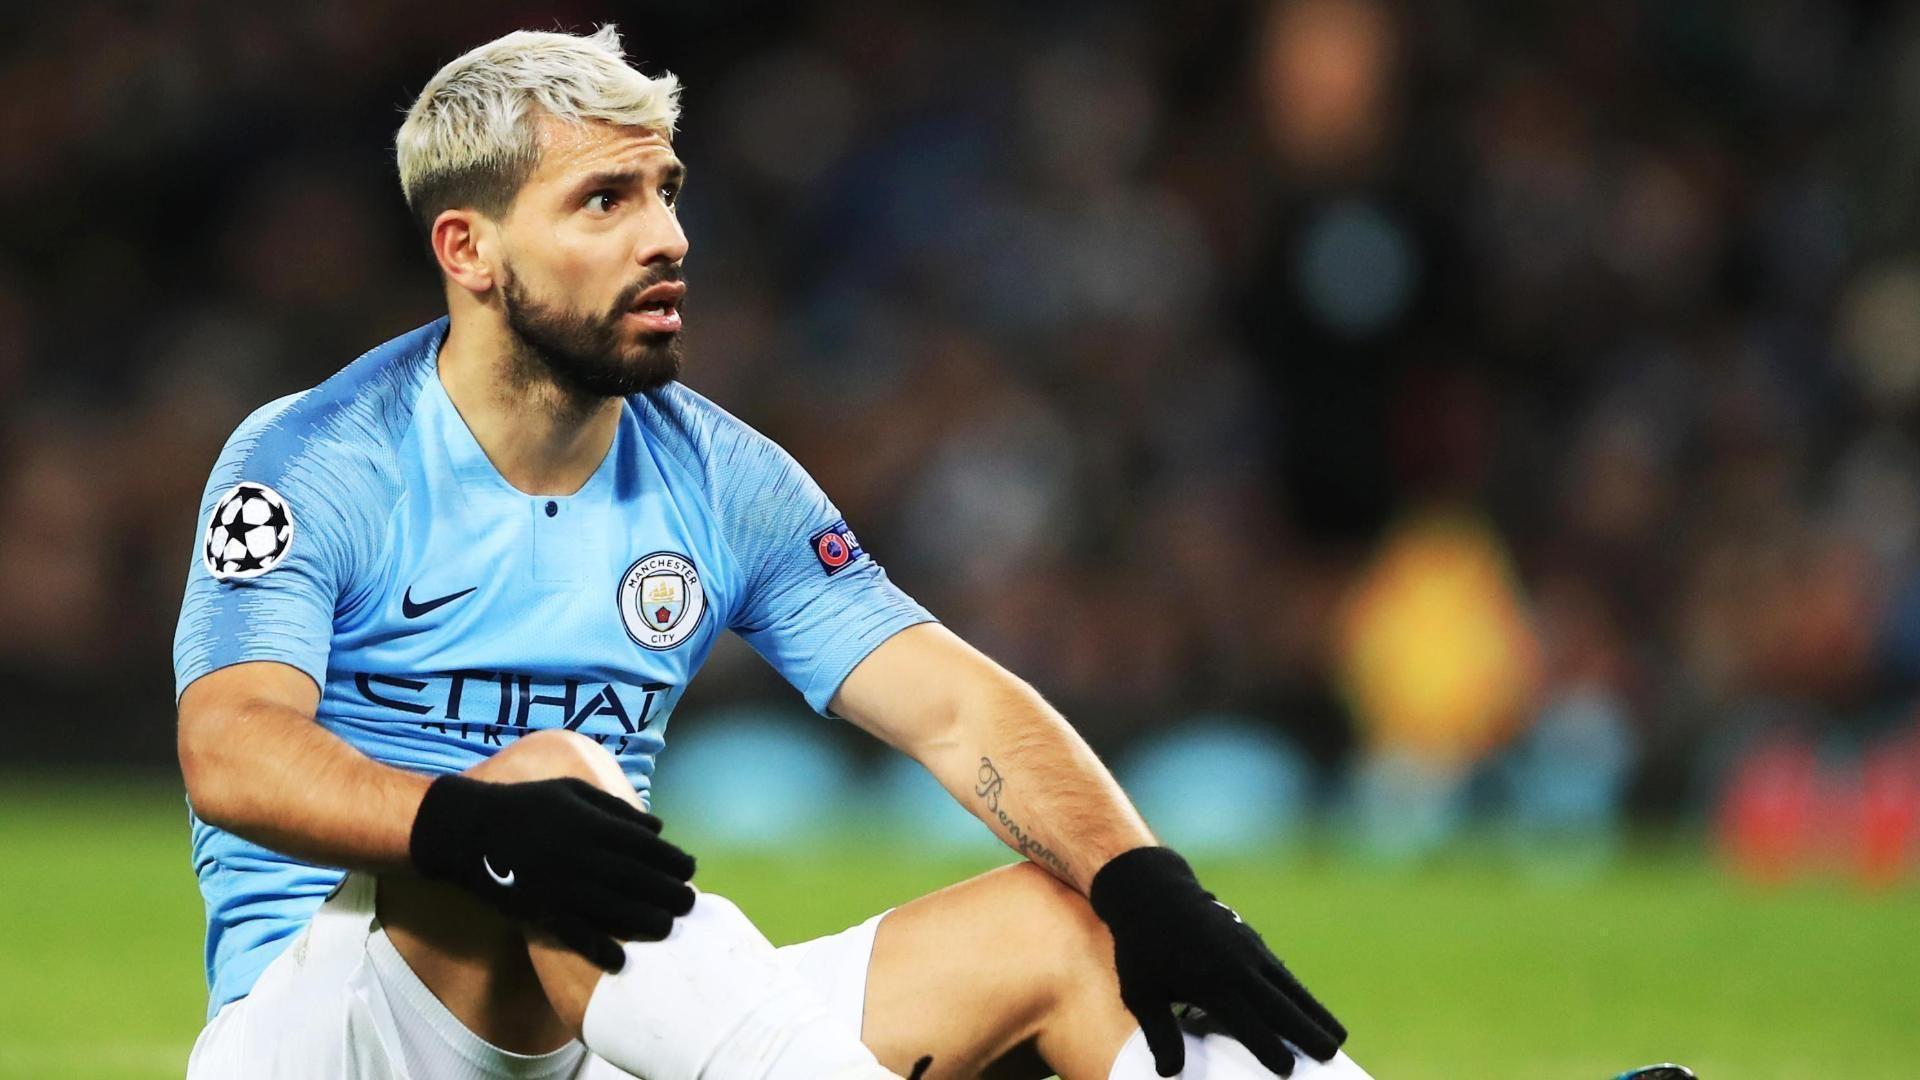 Man City's De Bruyne Stones Fernandinho could return for Fulham clash - sources 2